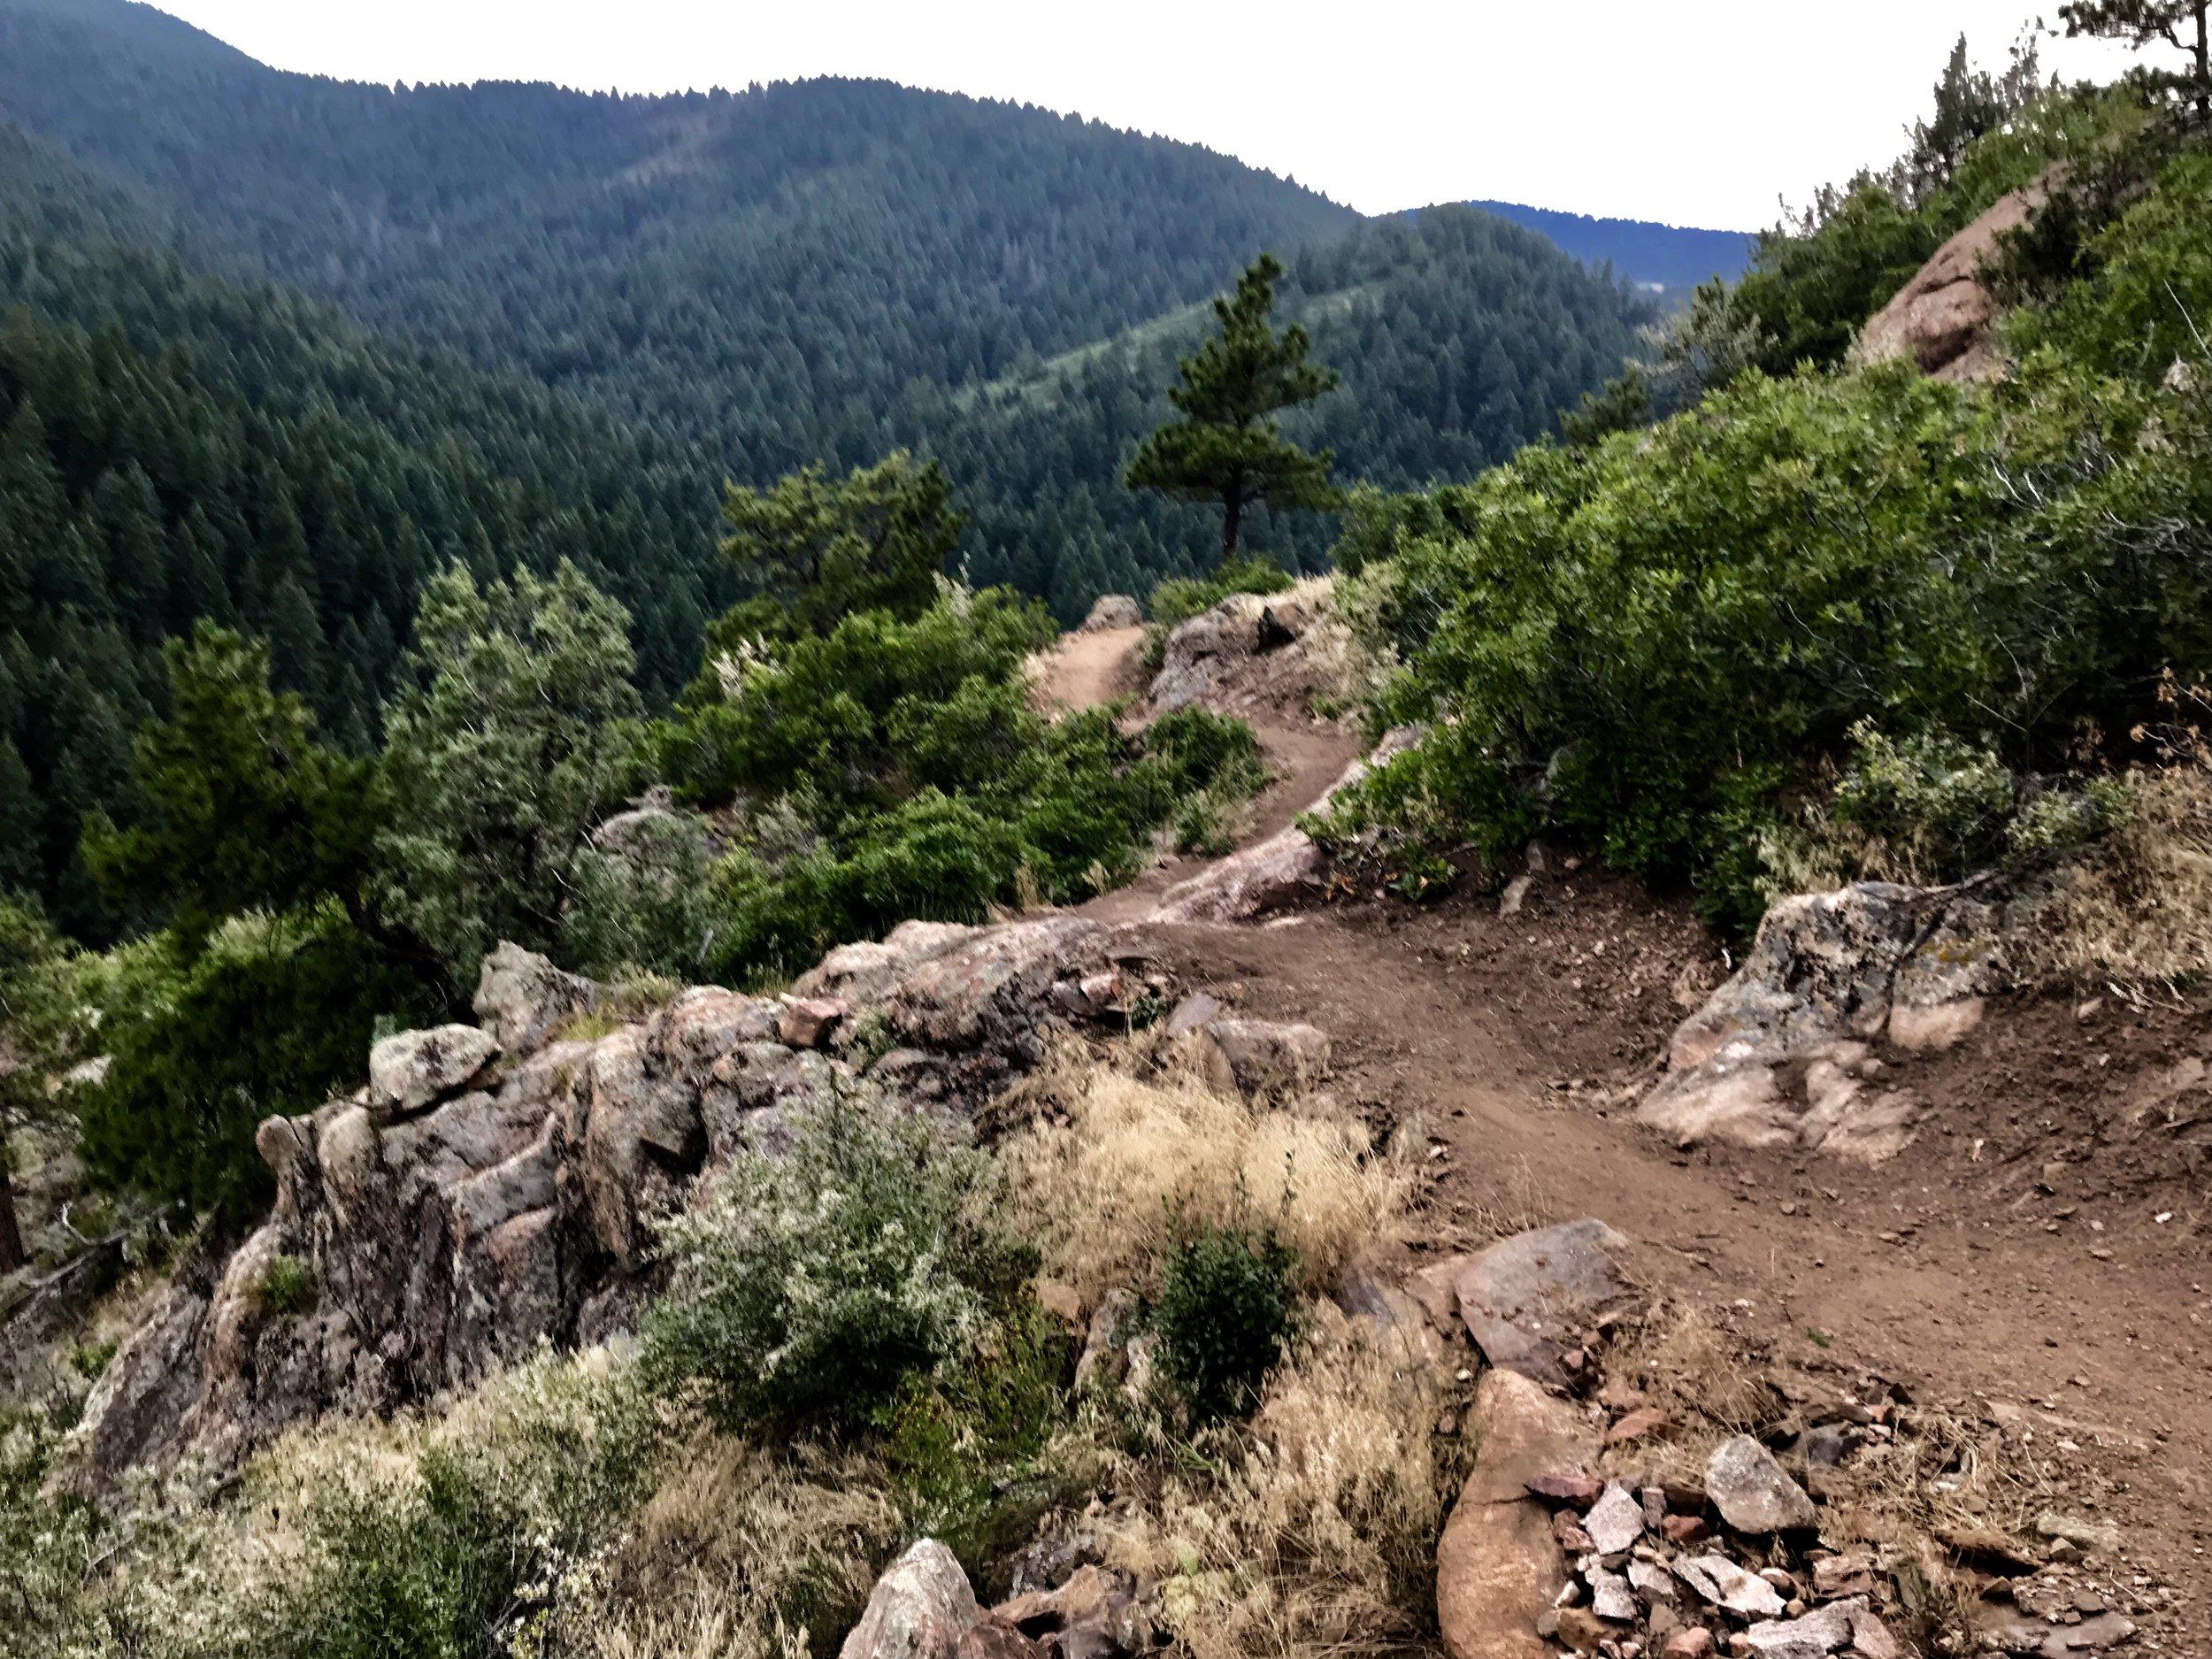 Black Bear Trail at Deer Creek Canyon, Ken Caryl, Colorado